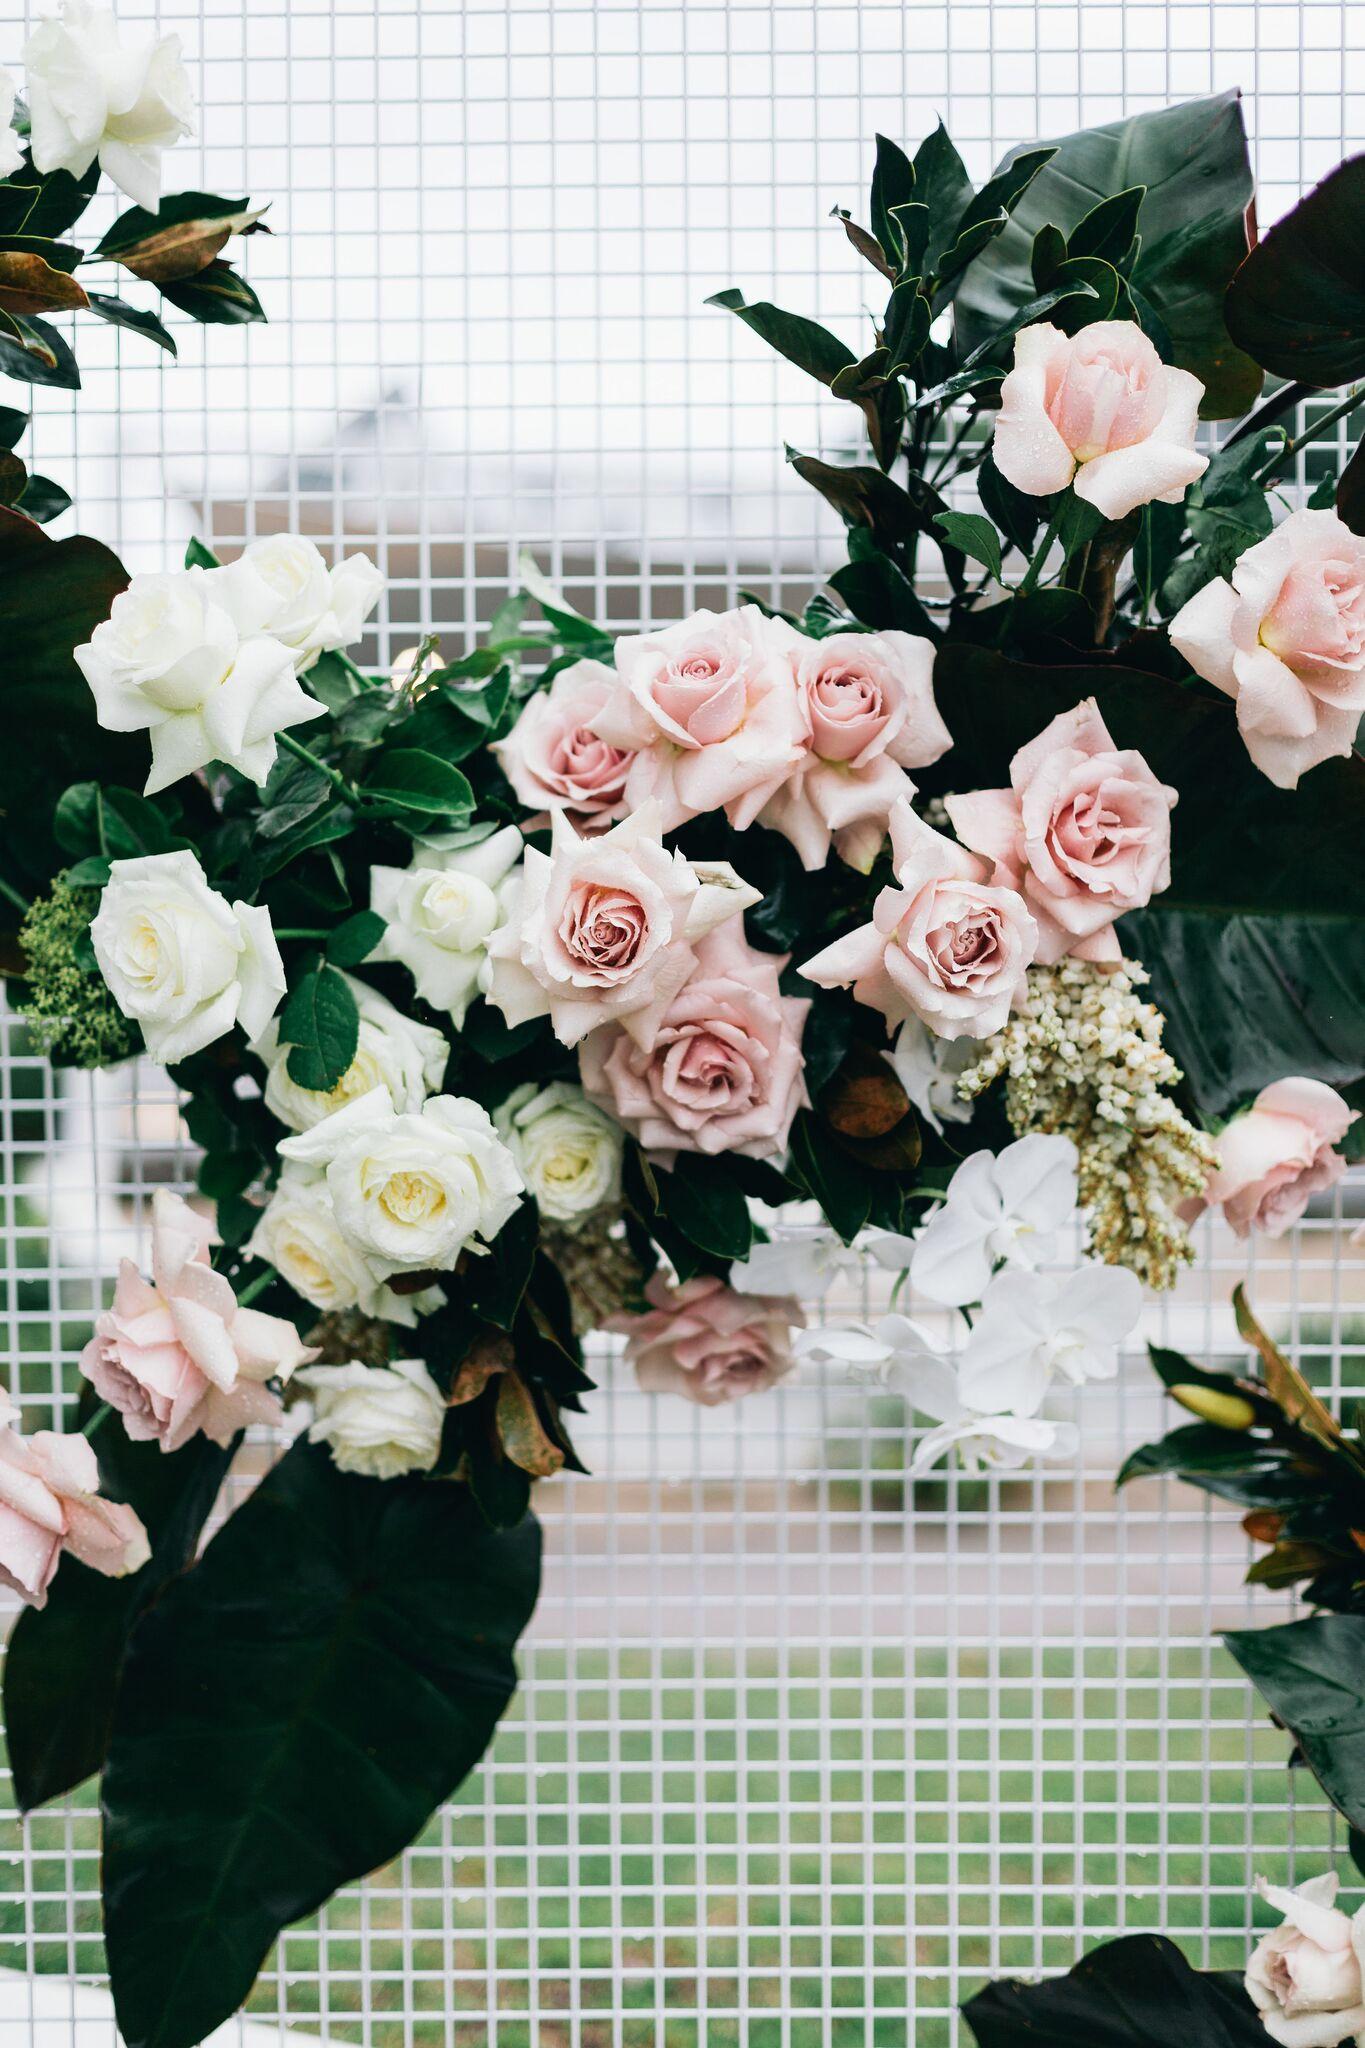 Creative wedding backdrop ideas inspiration hire3.jpeg